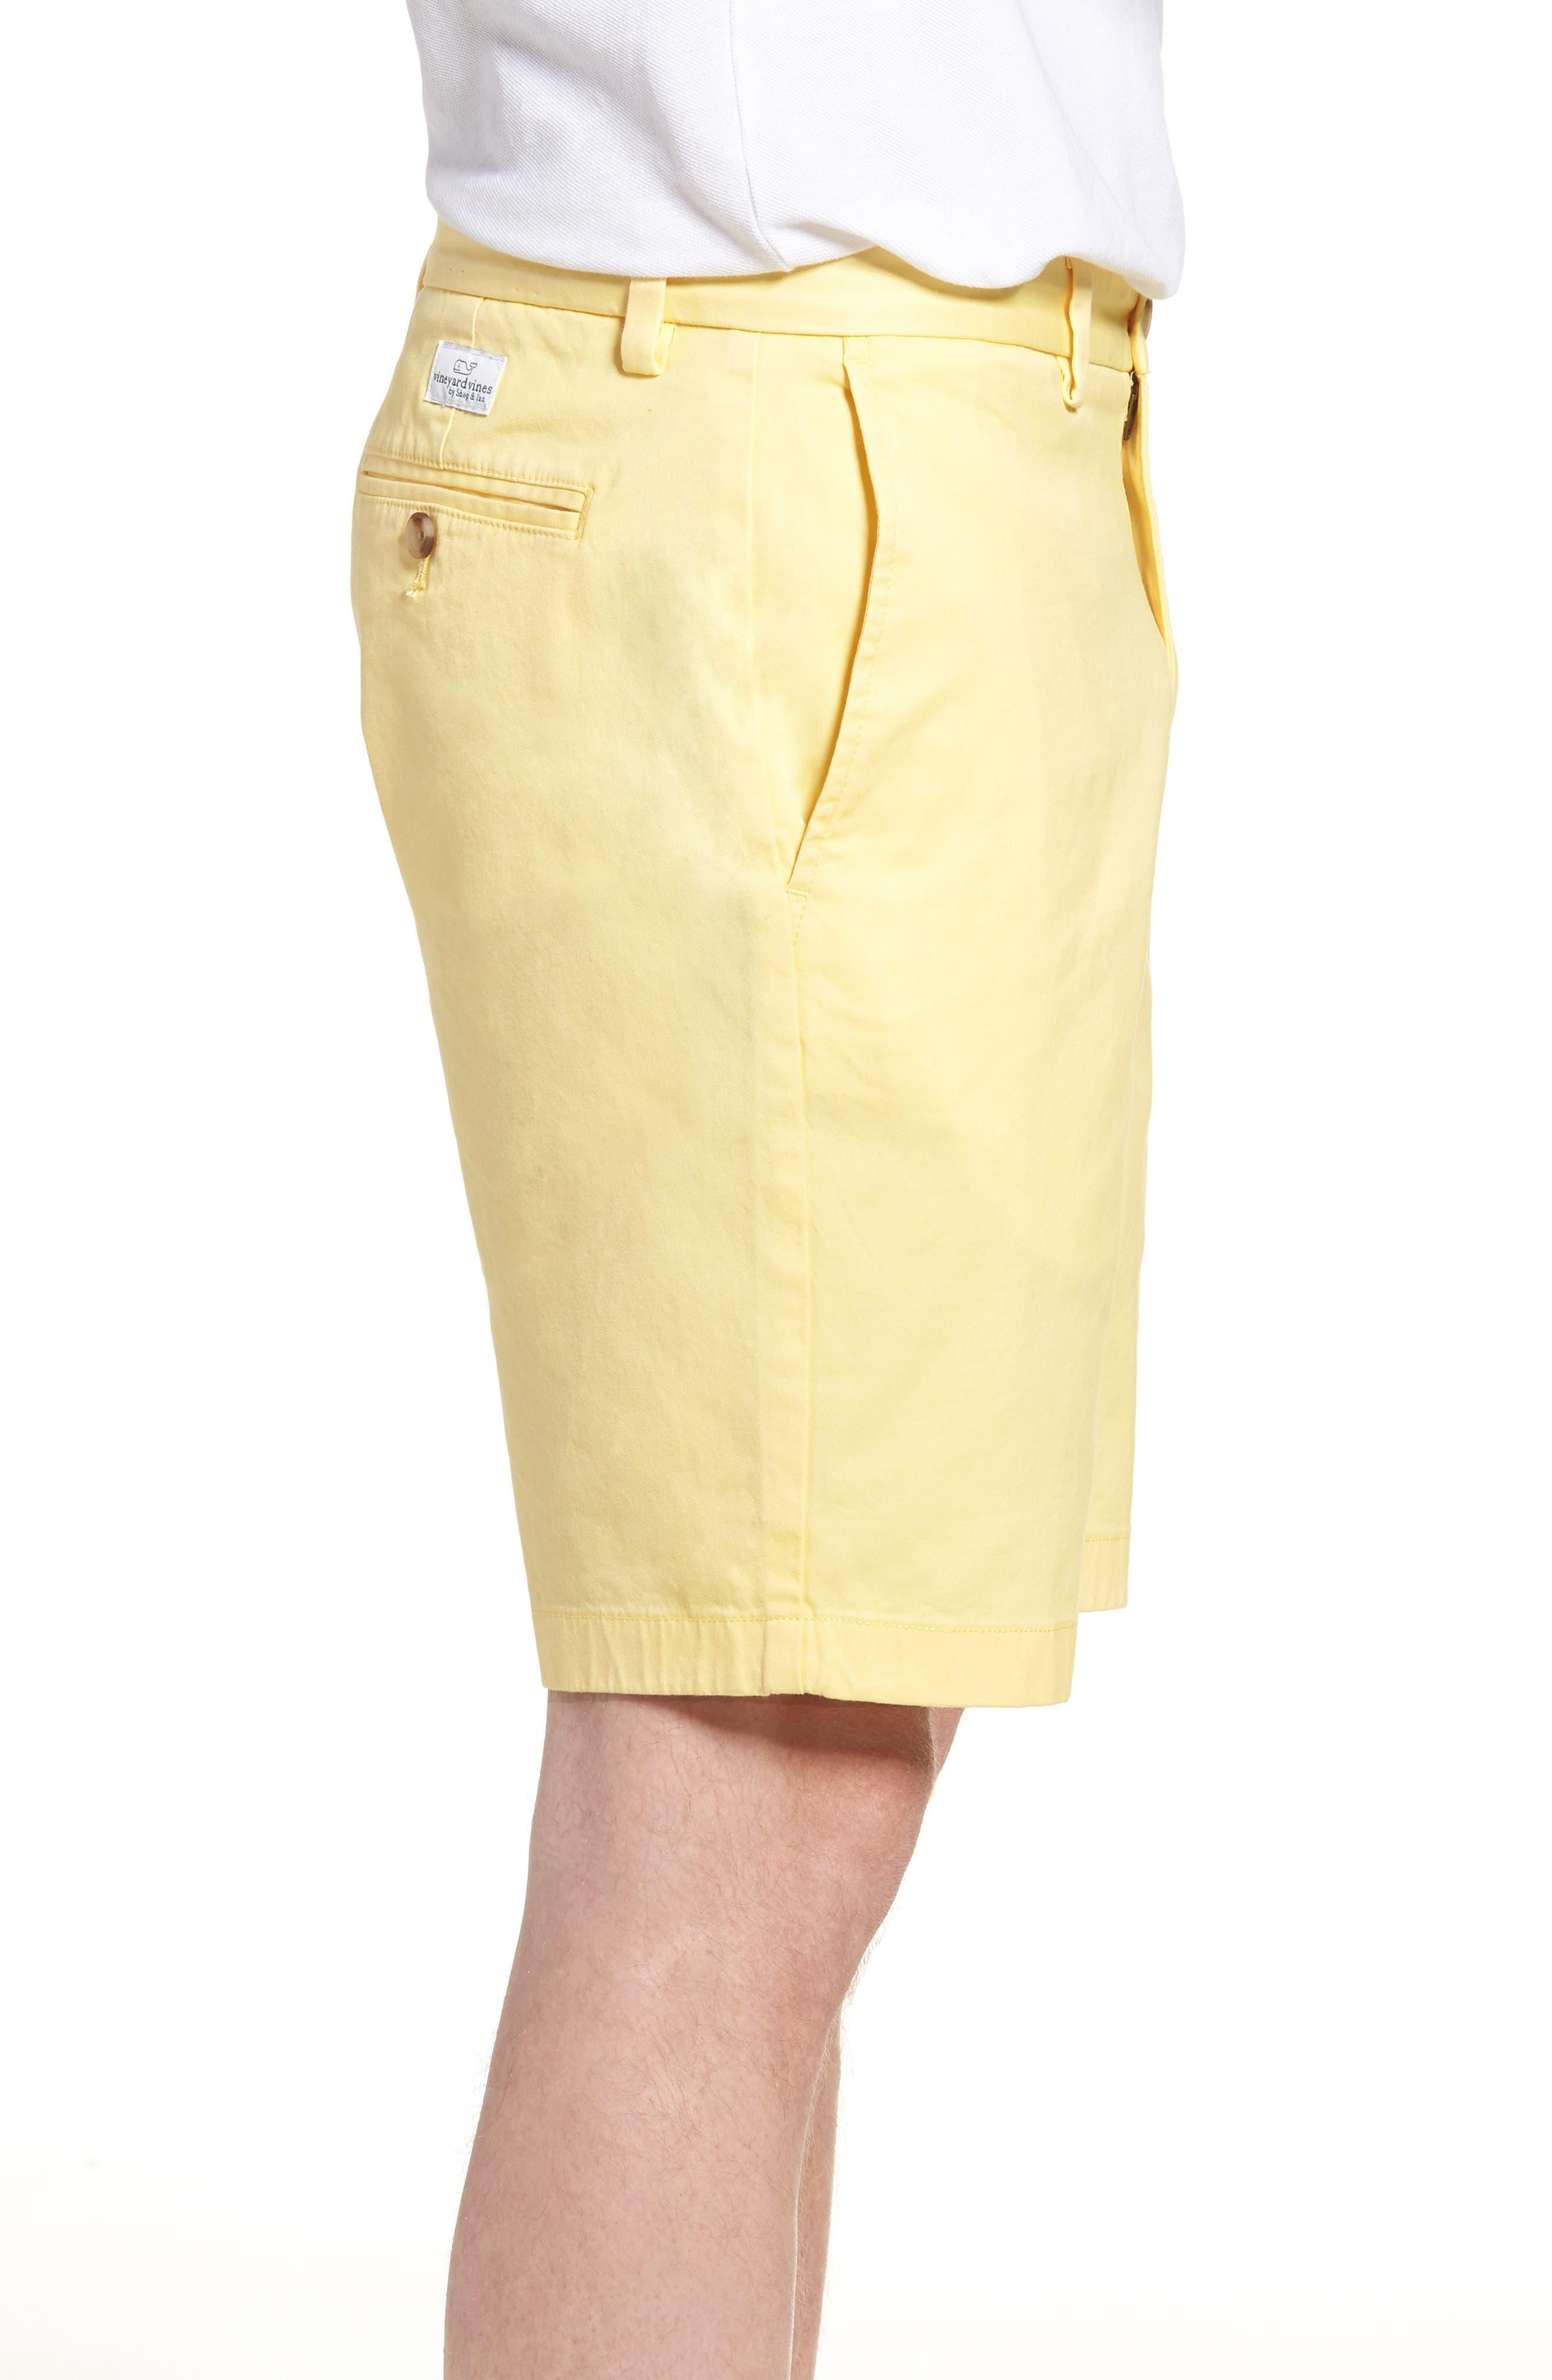 9 Inch Stretch Breaker Shorts,                             Alternate thumbnail 55, color,